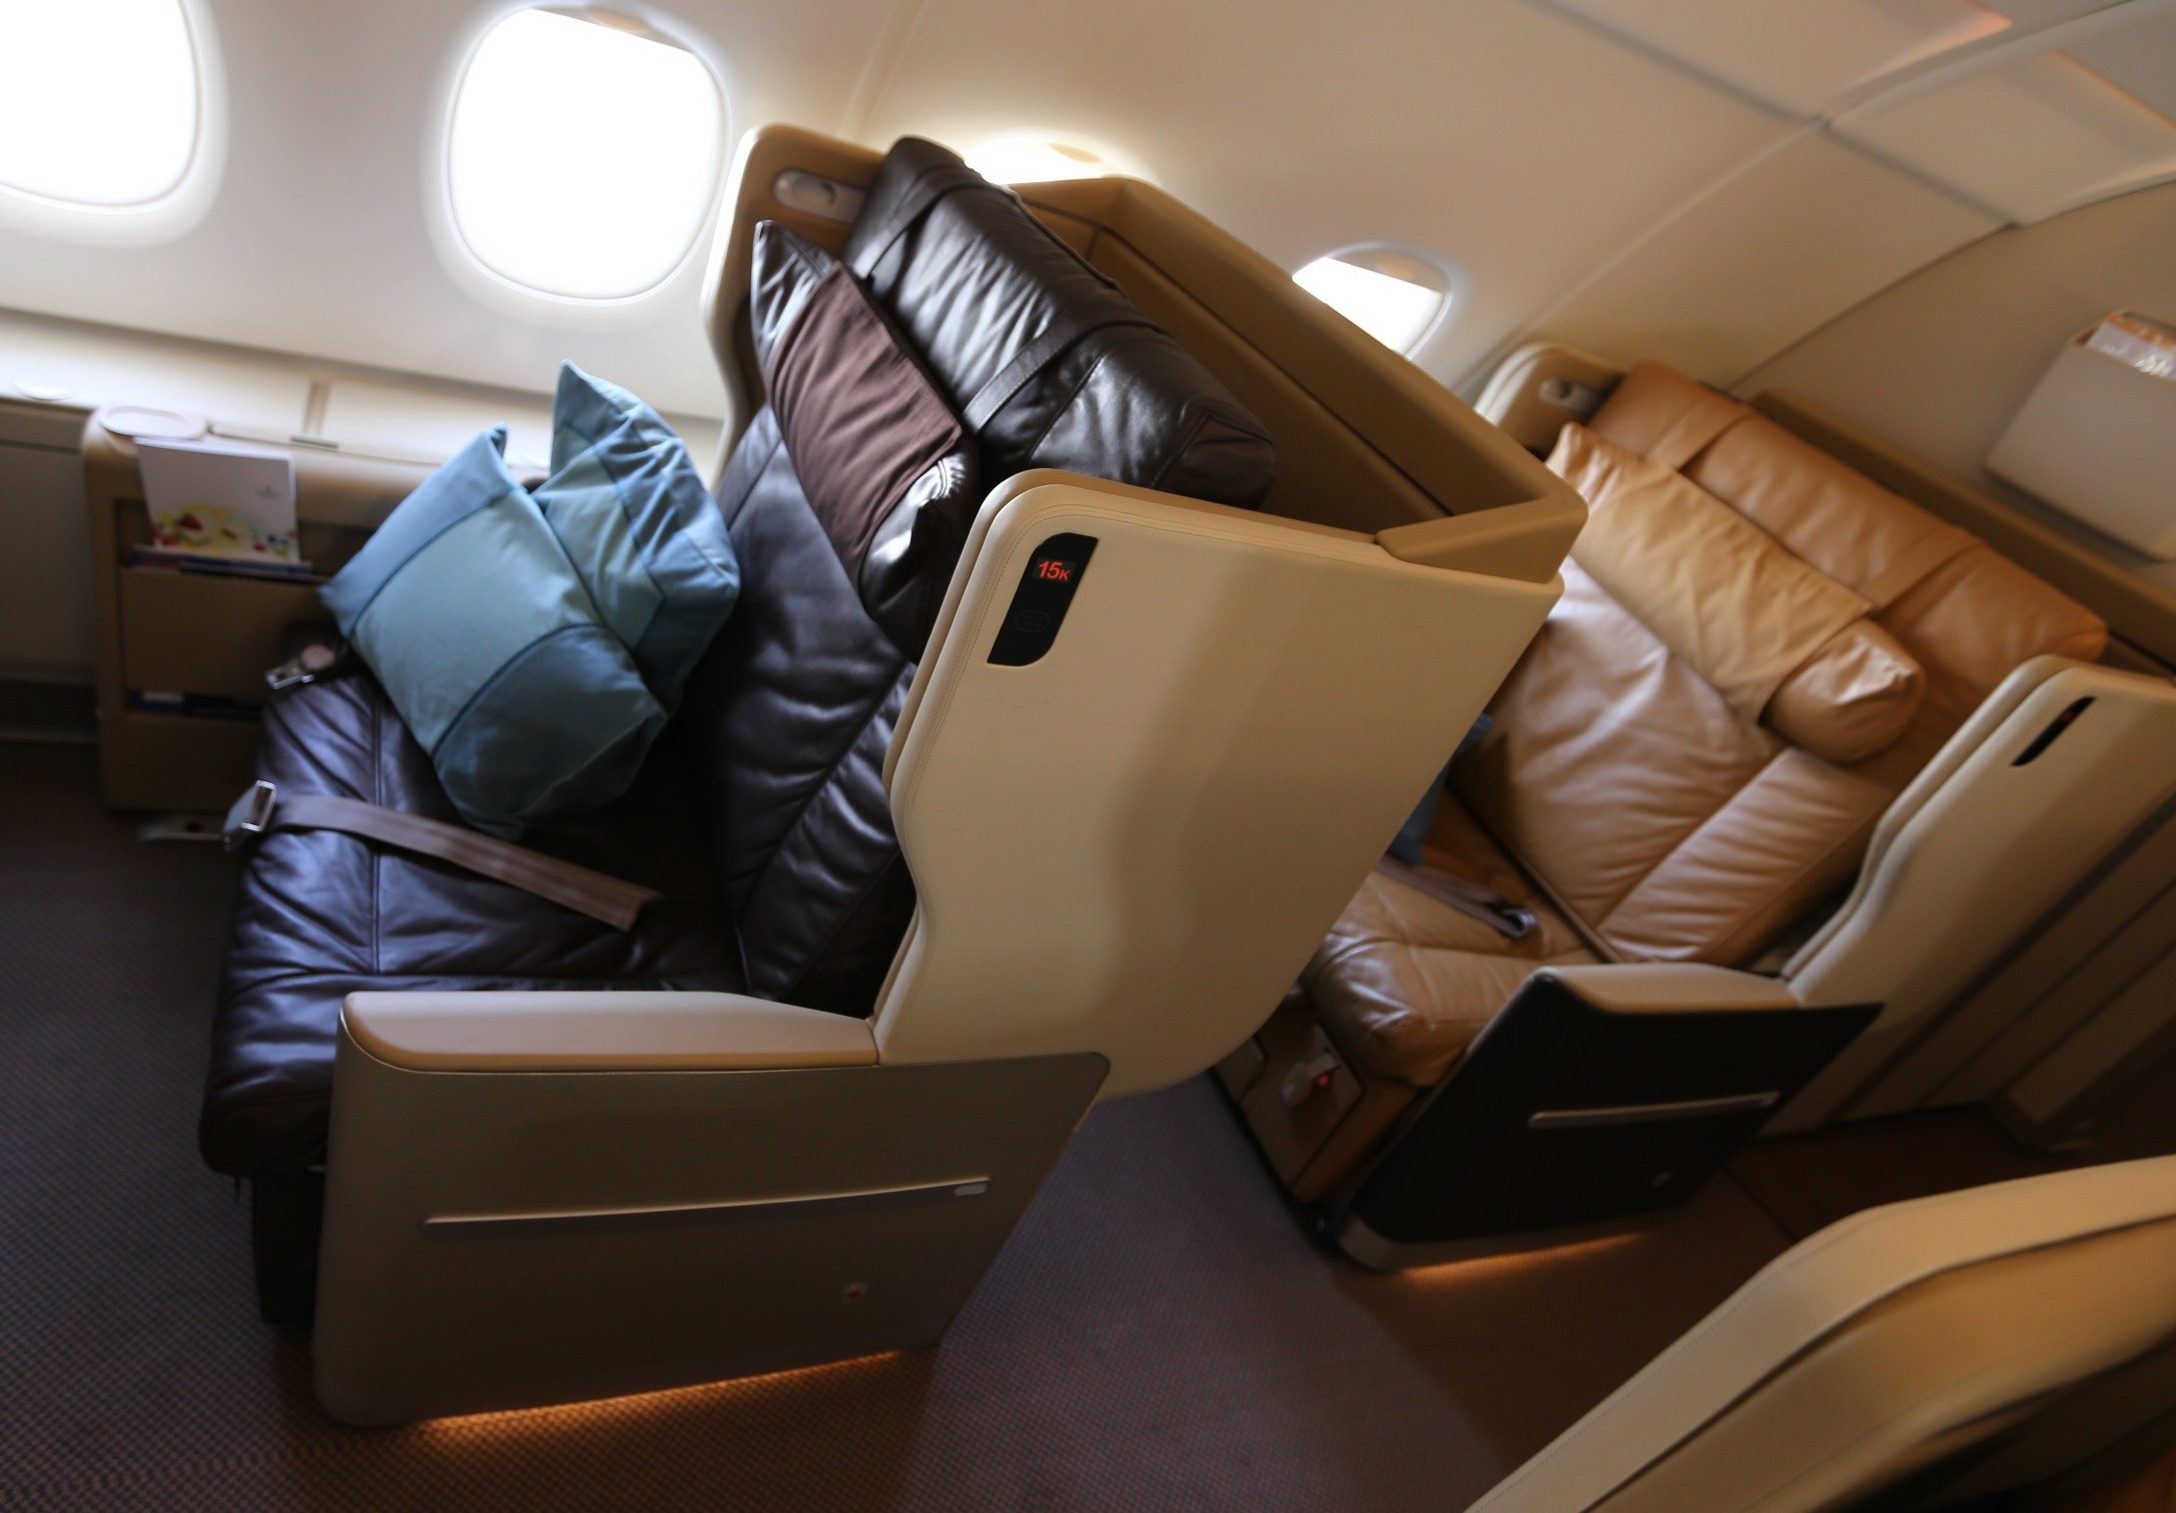 2006 J A380 2 (Daniel Gillaspia)